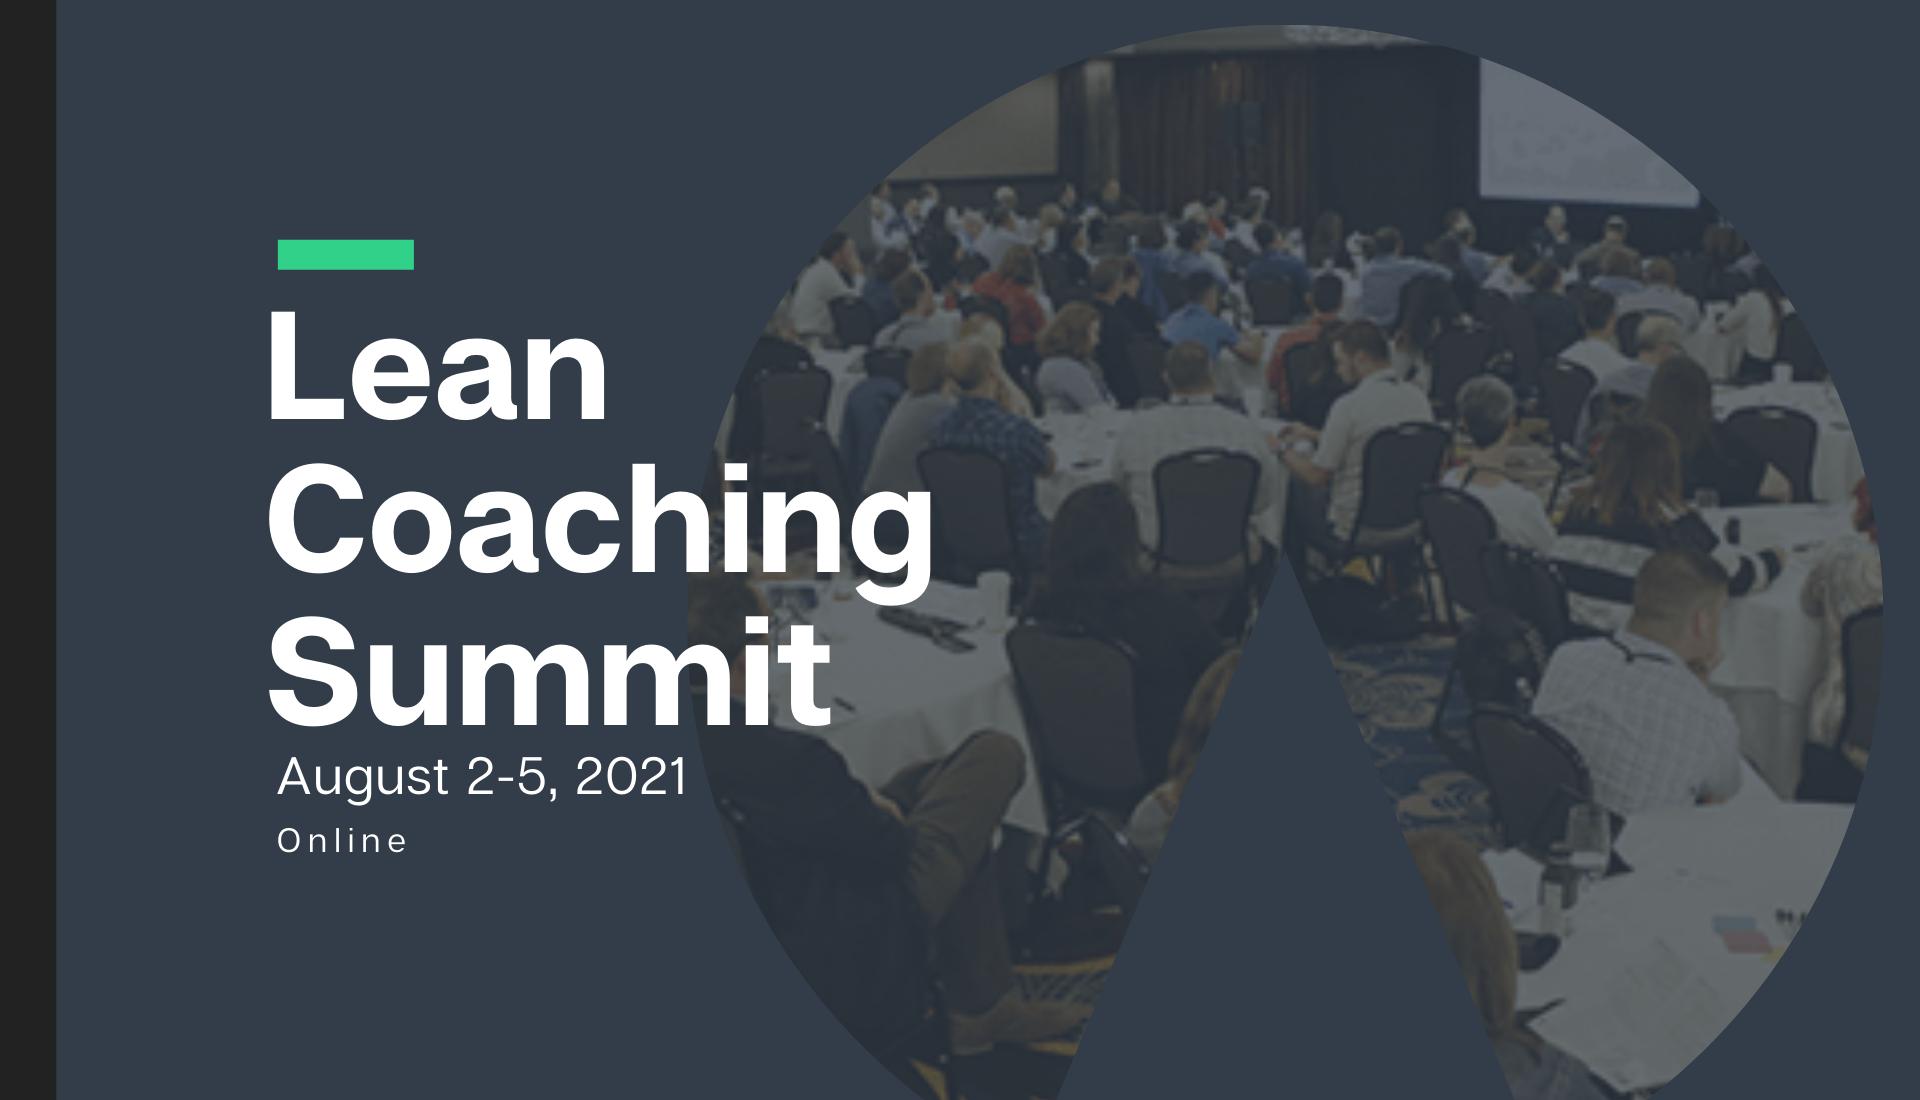 2021 Lean Coaching Summit